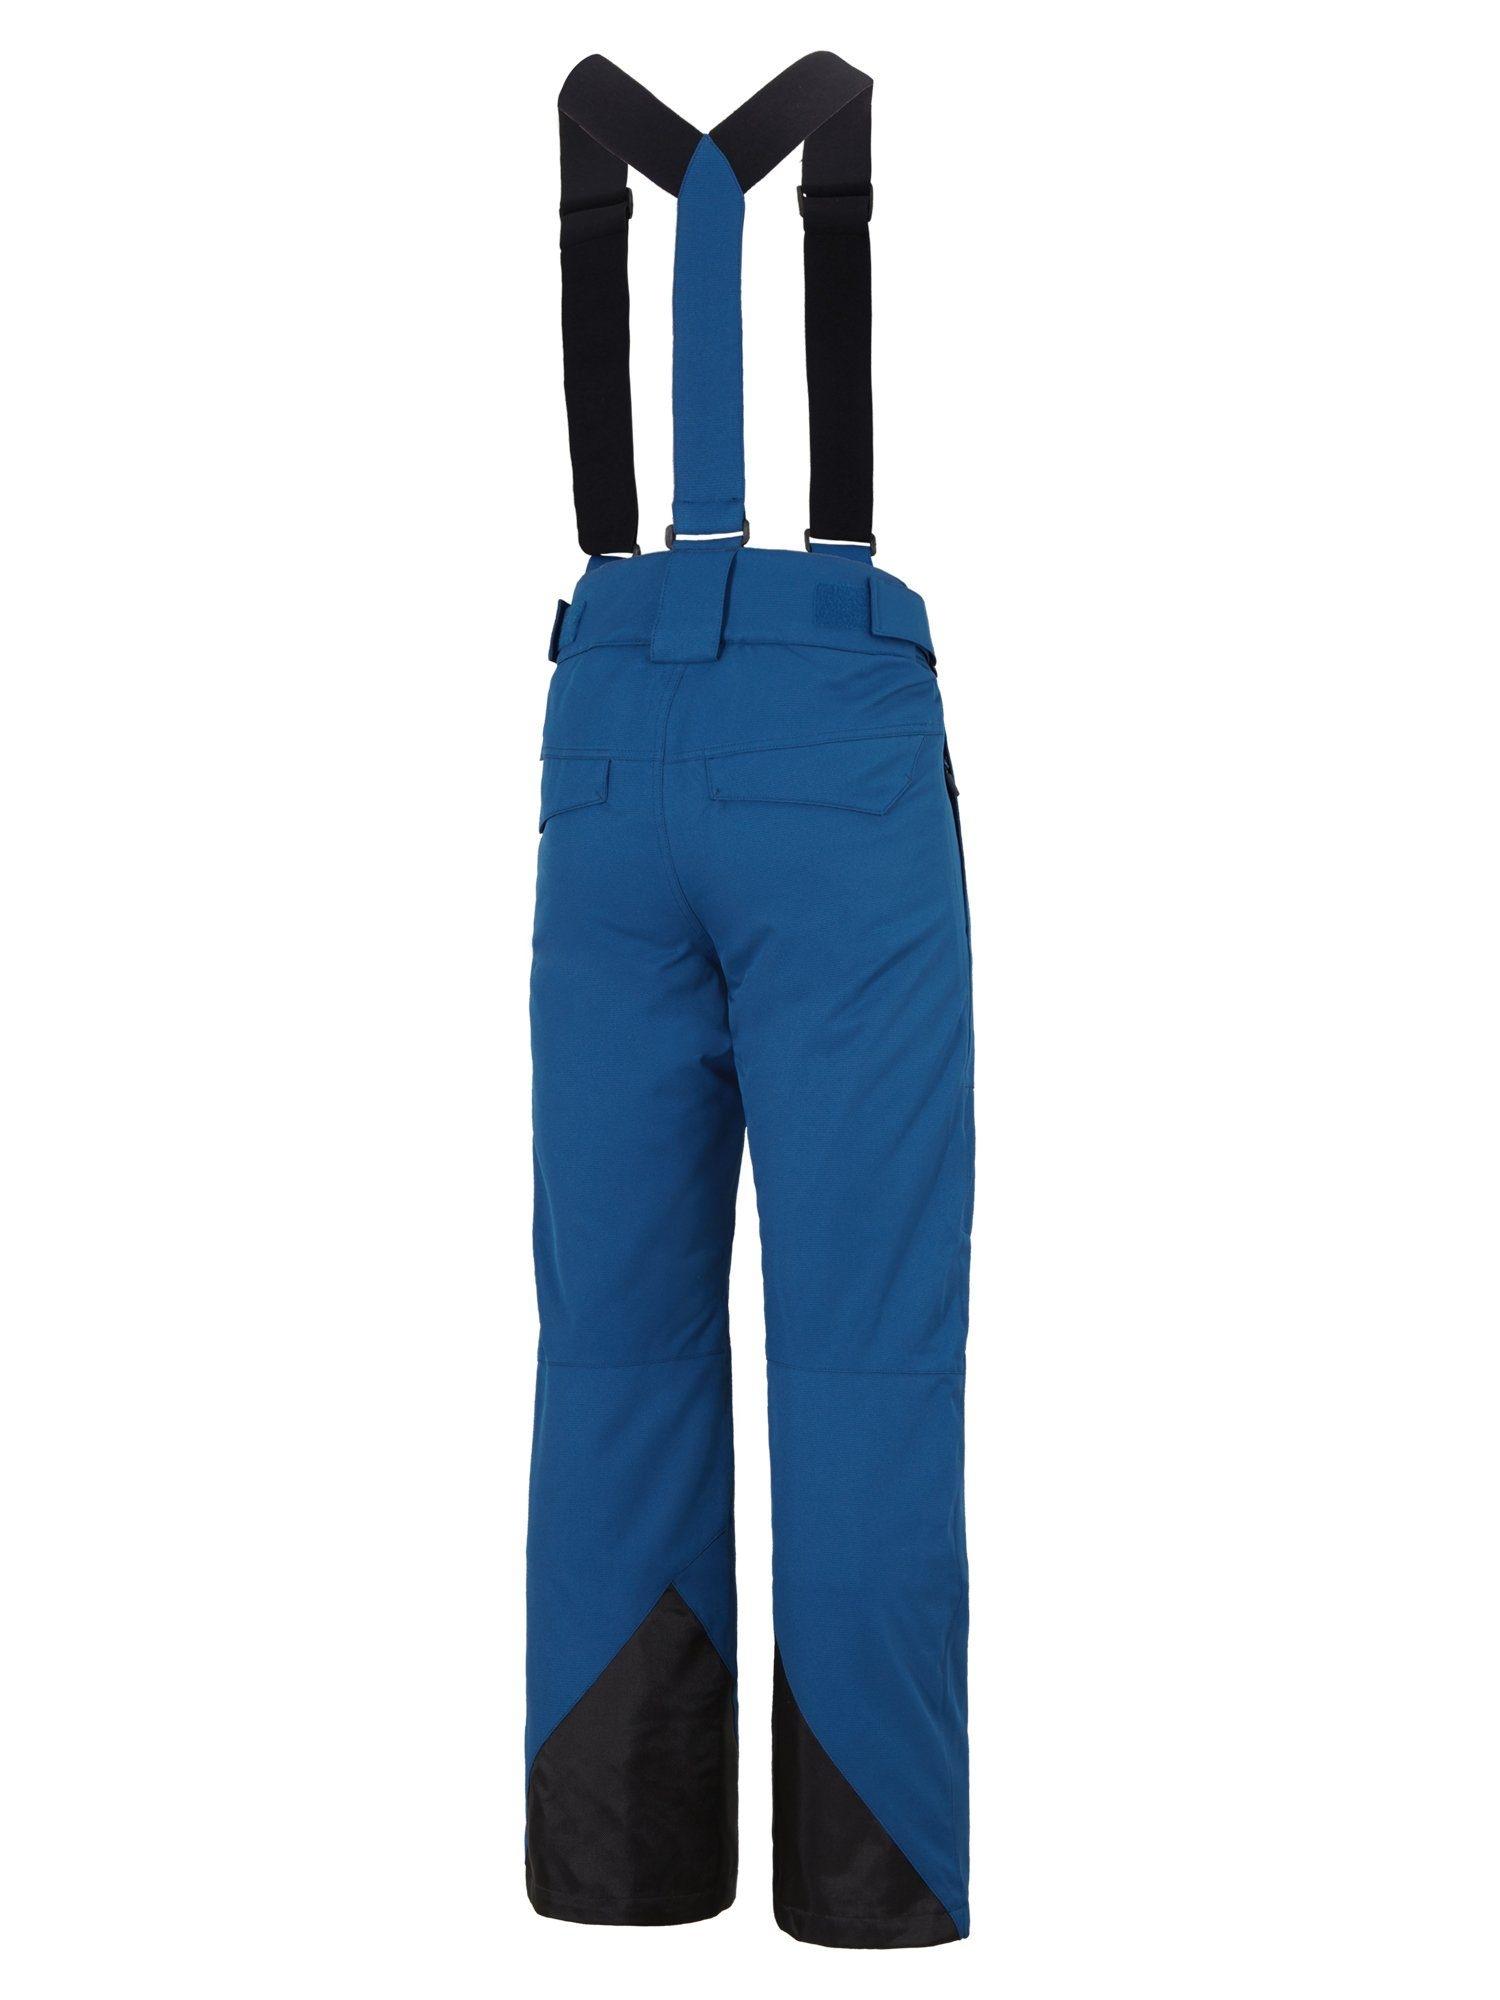 Ziener Herren Telmo Skihose 194206 blau